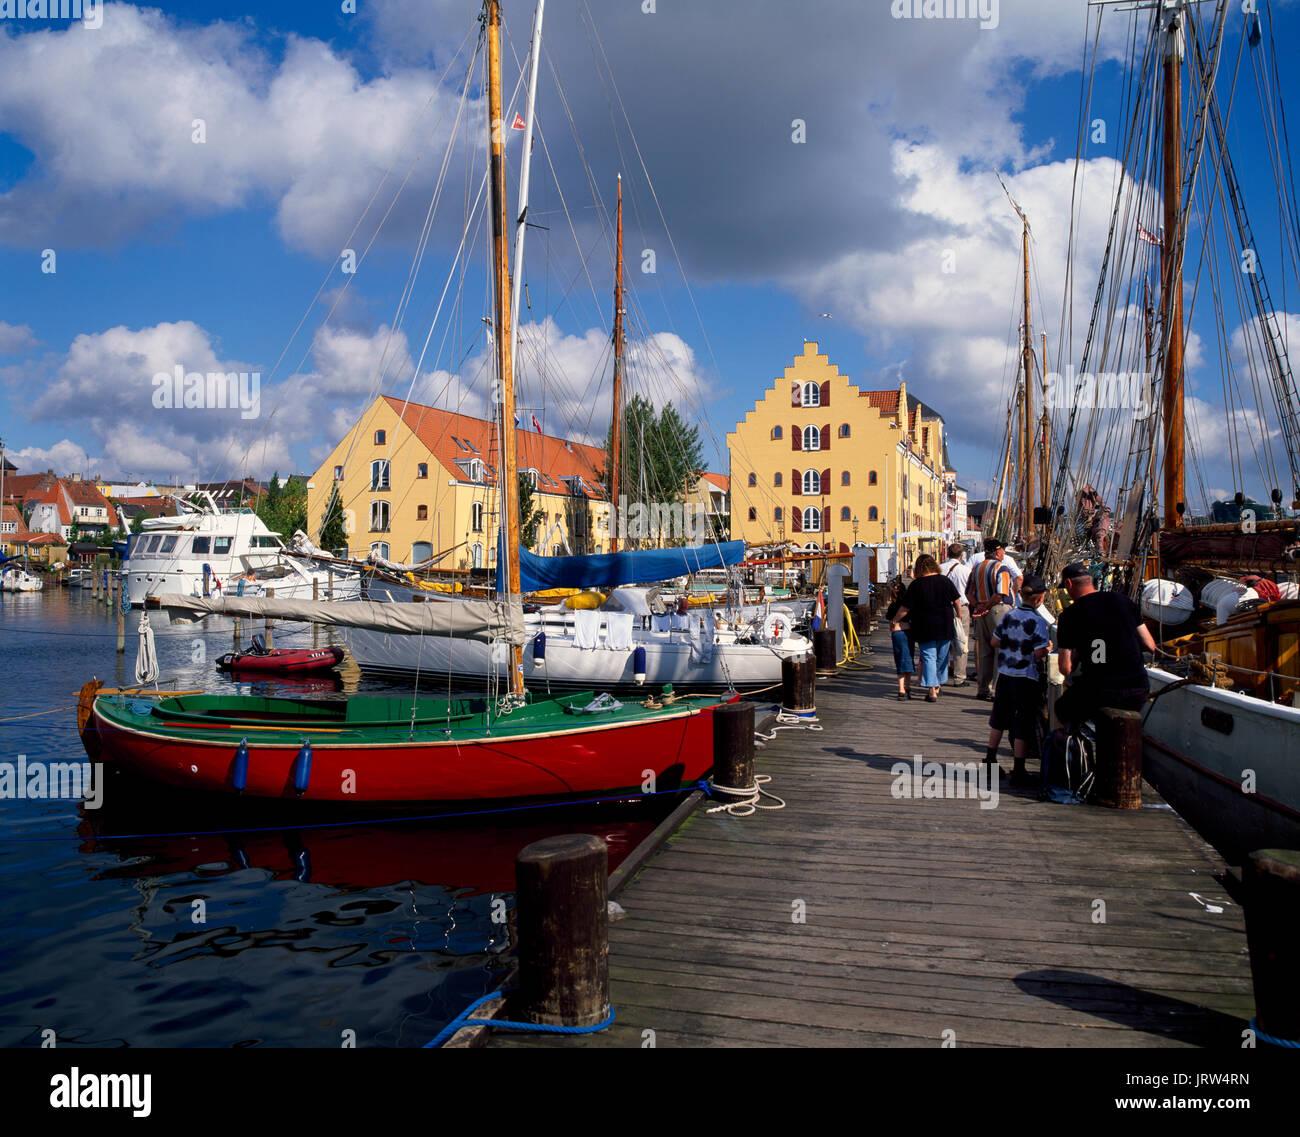 Sailing ships at Svendborg harbour, funen, Denmark, Scandinavia, Europe - Stock Image